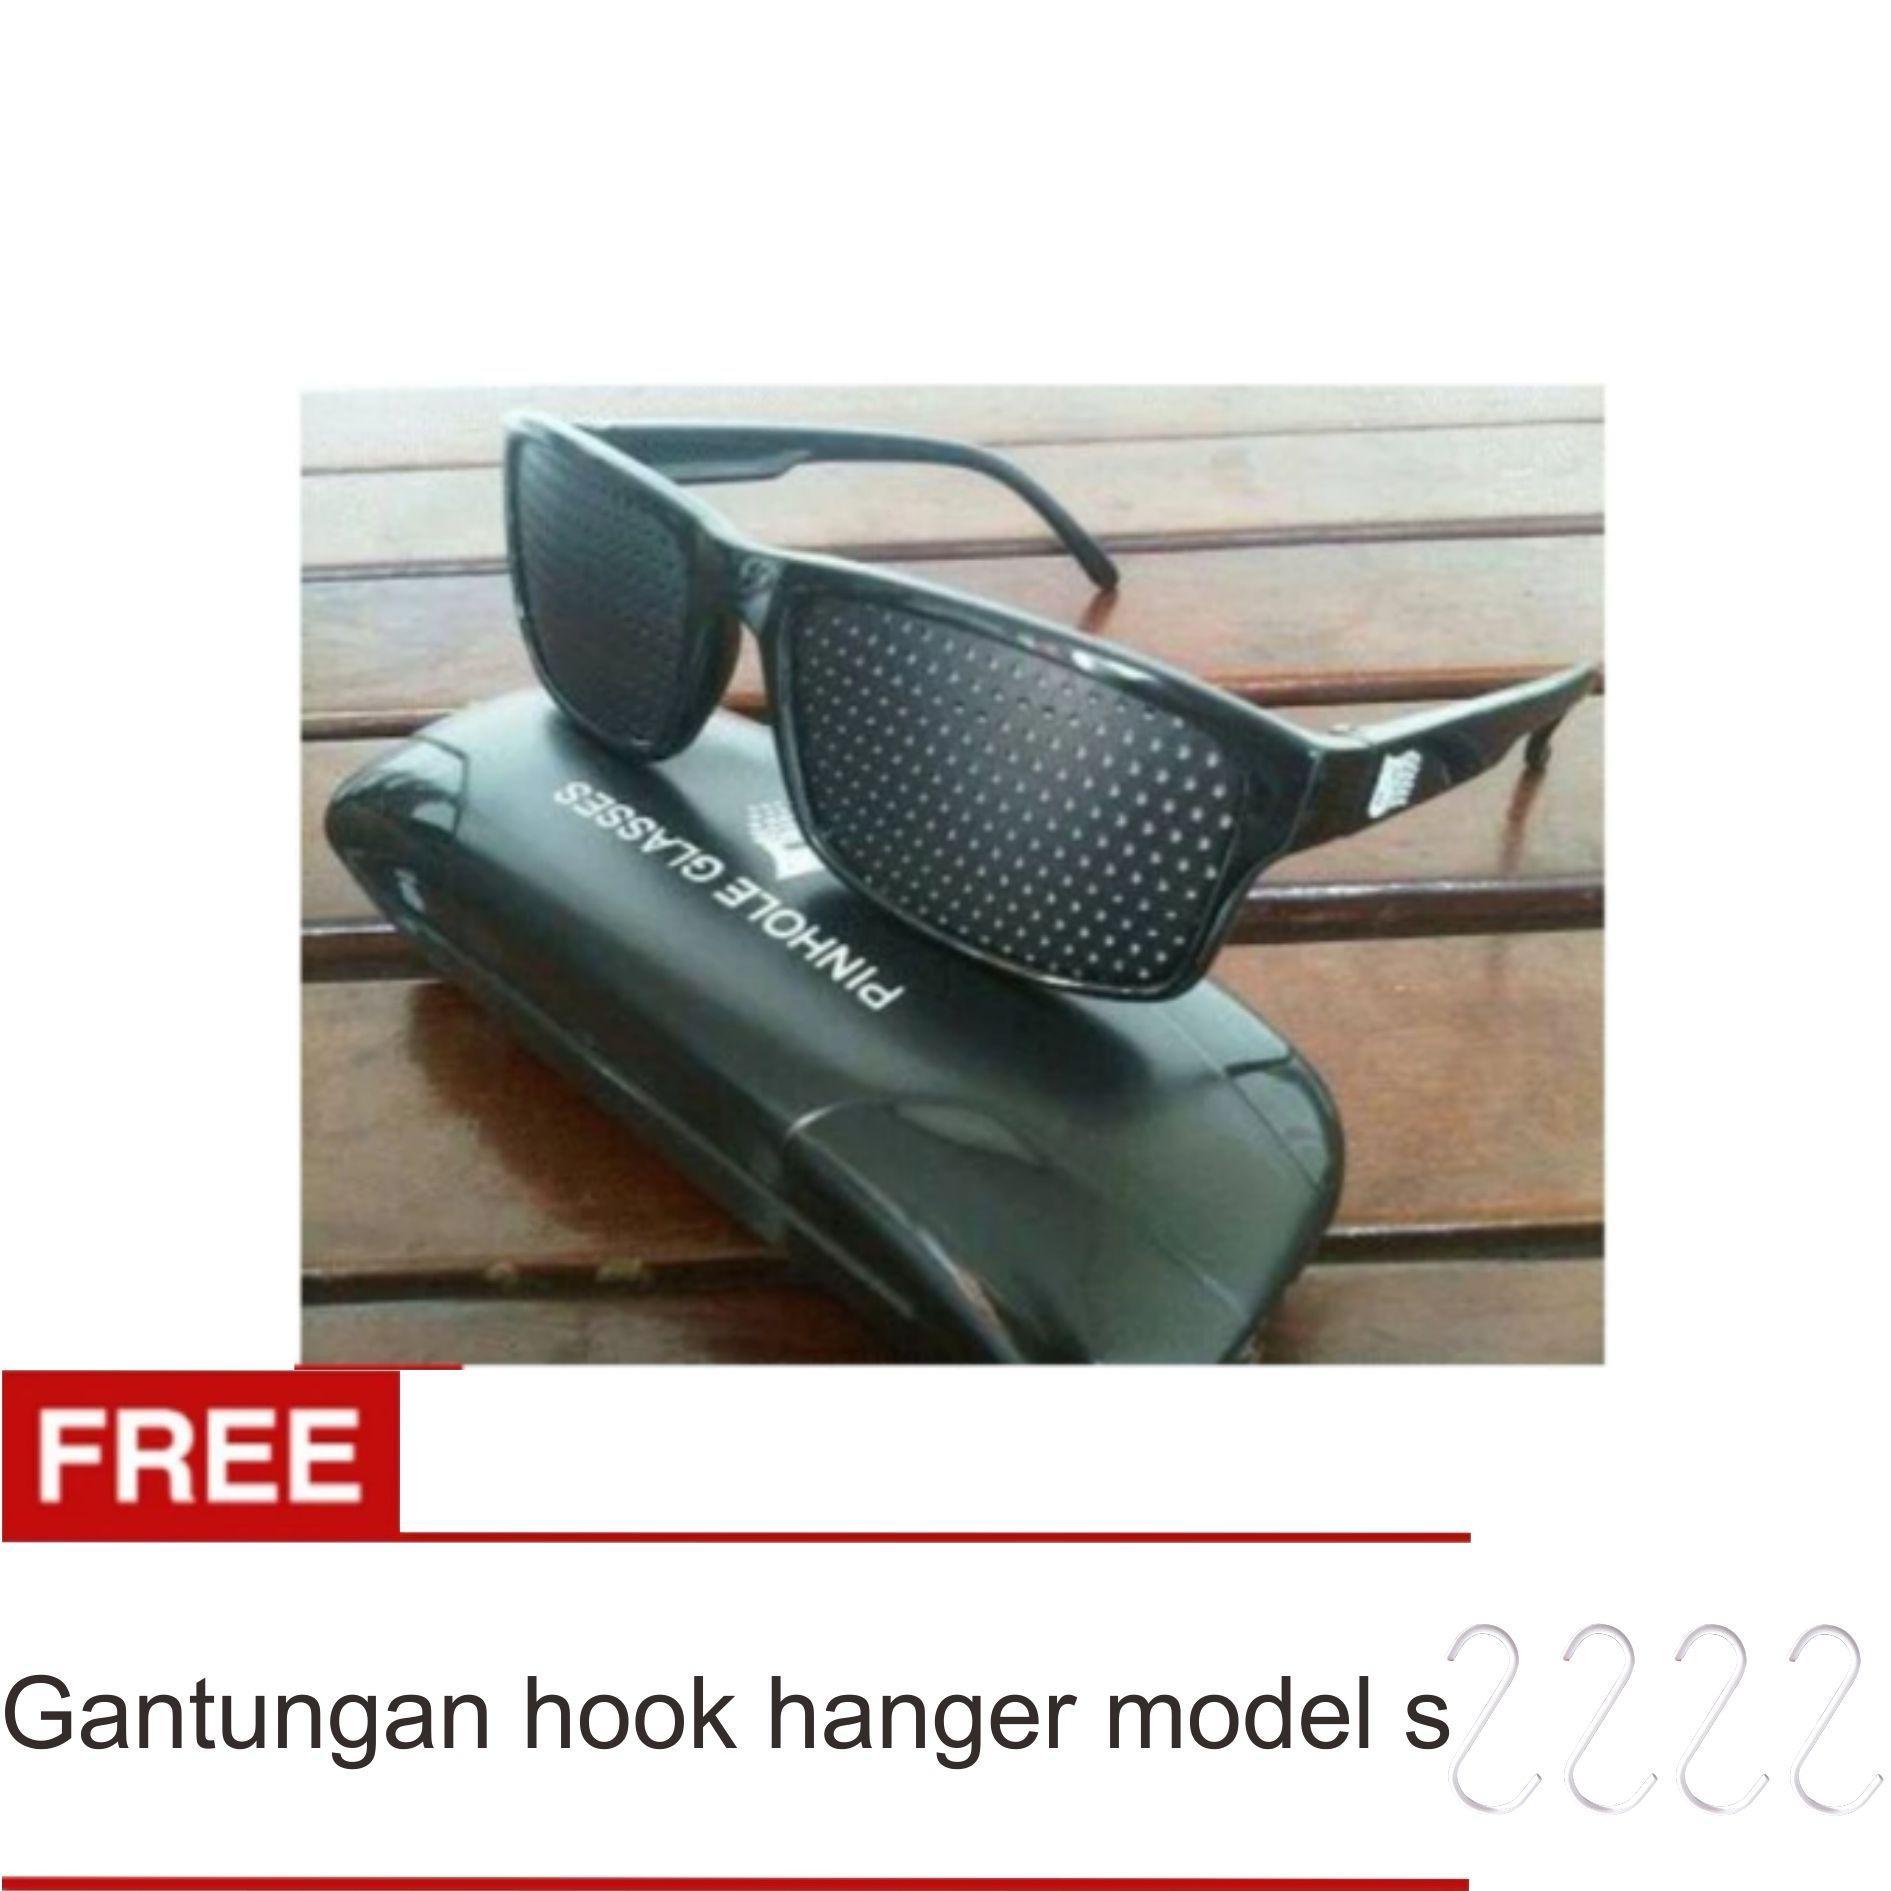 Lanjarjaya Kacamata Terapi Pinhole glasses tipe Tp-01 (bonus box) + Gantungan Hook Hanger Model S Set